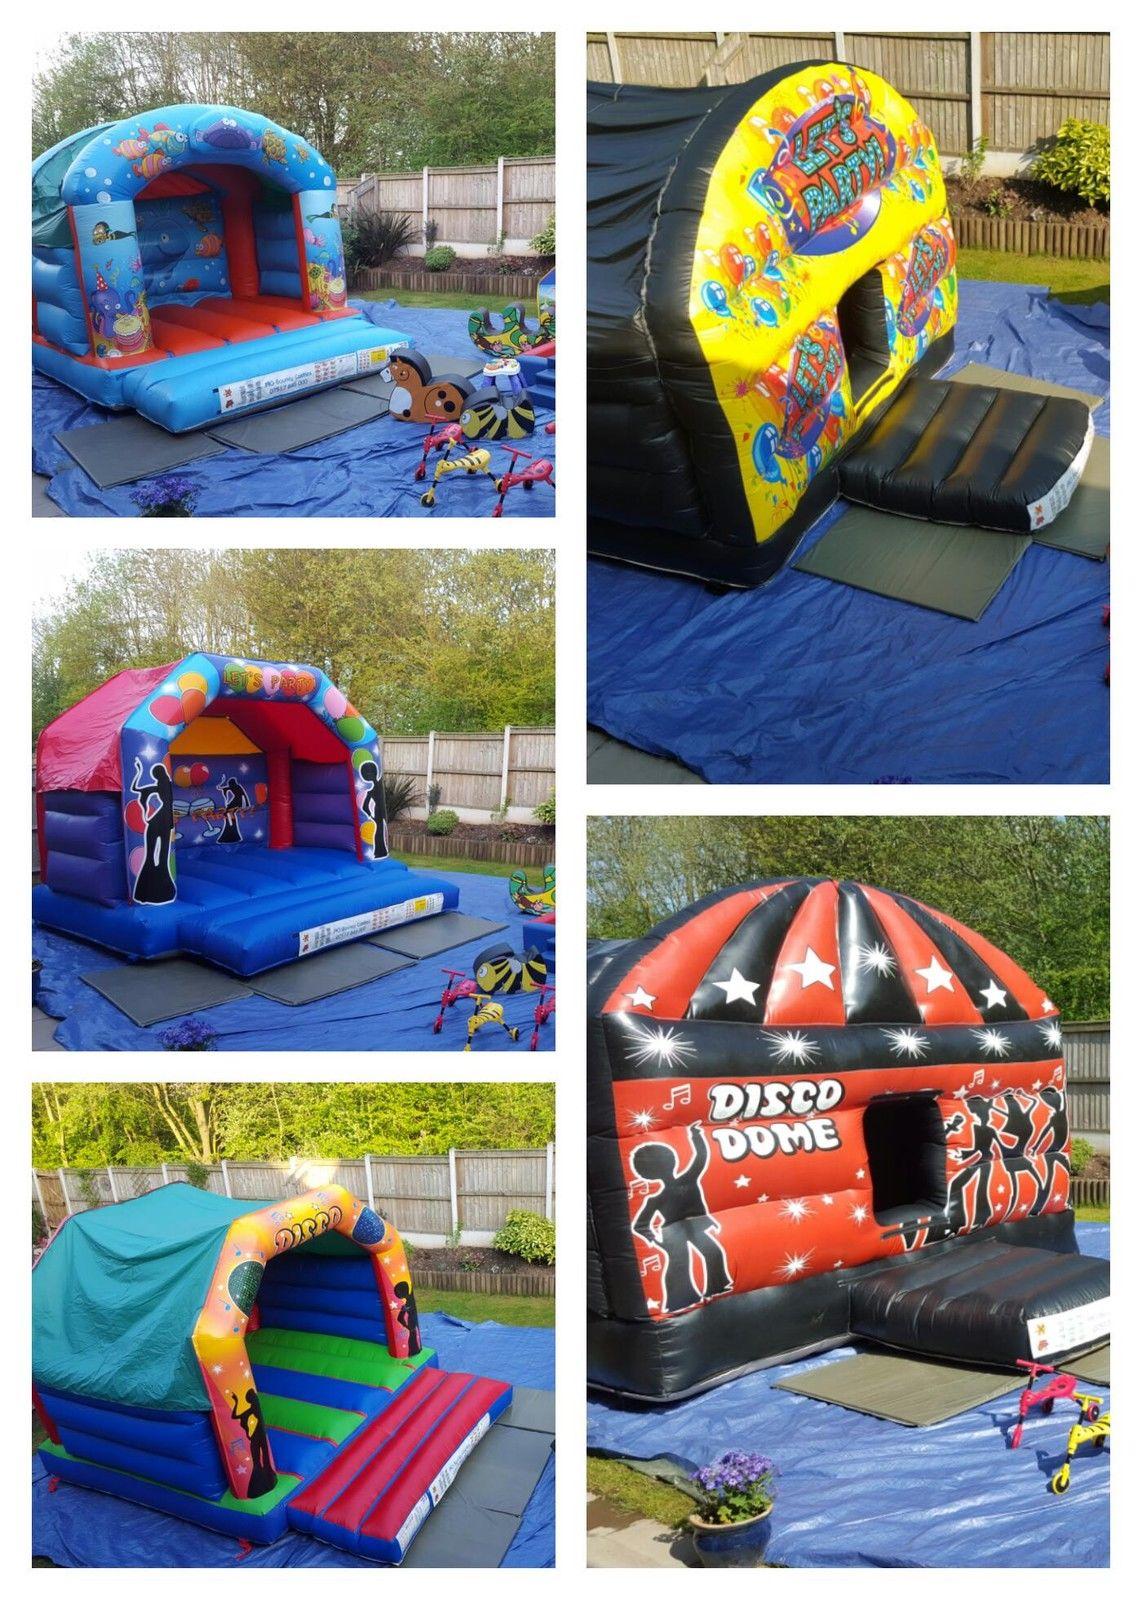 JAG Bouncy castles's main image